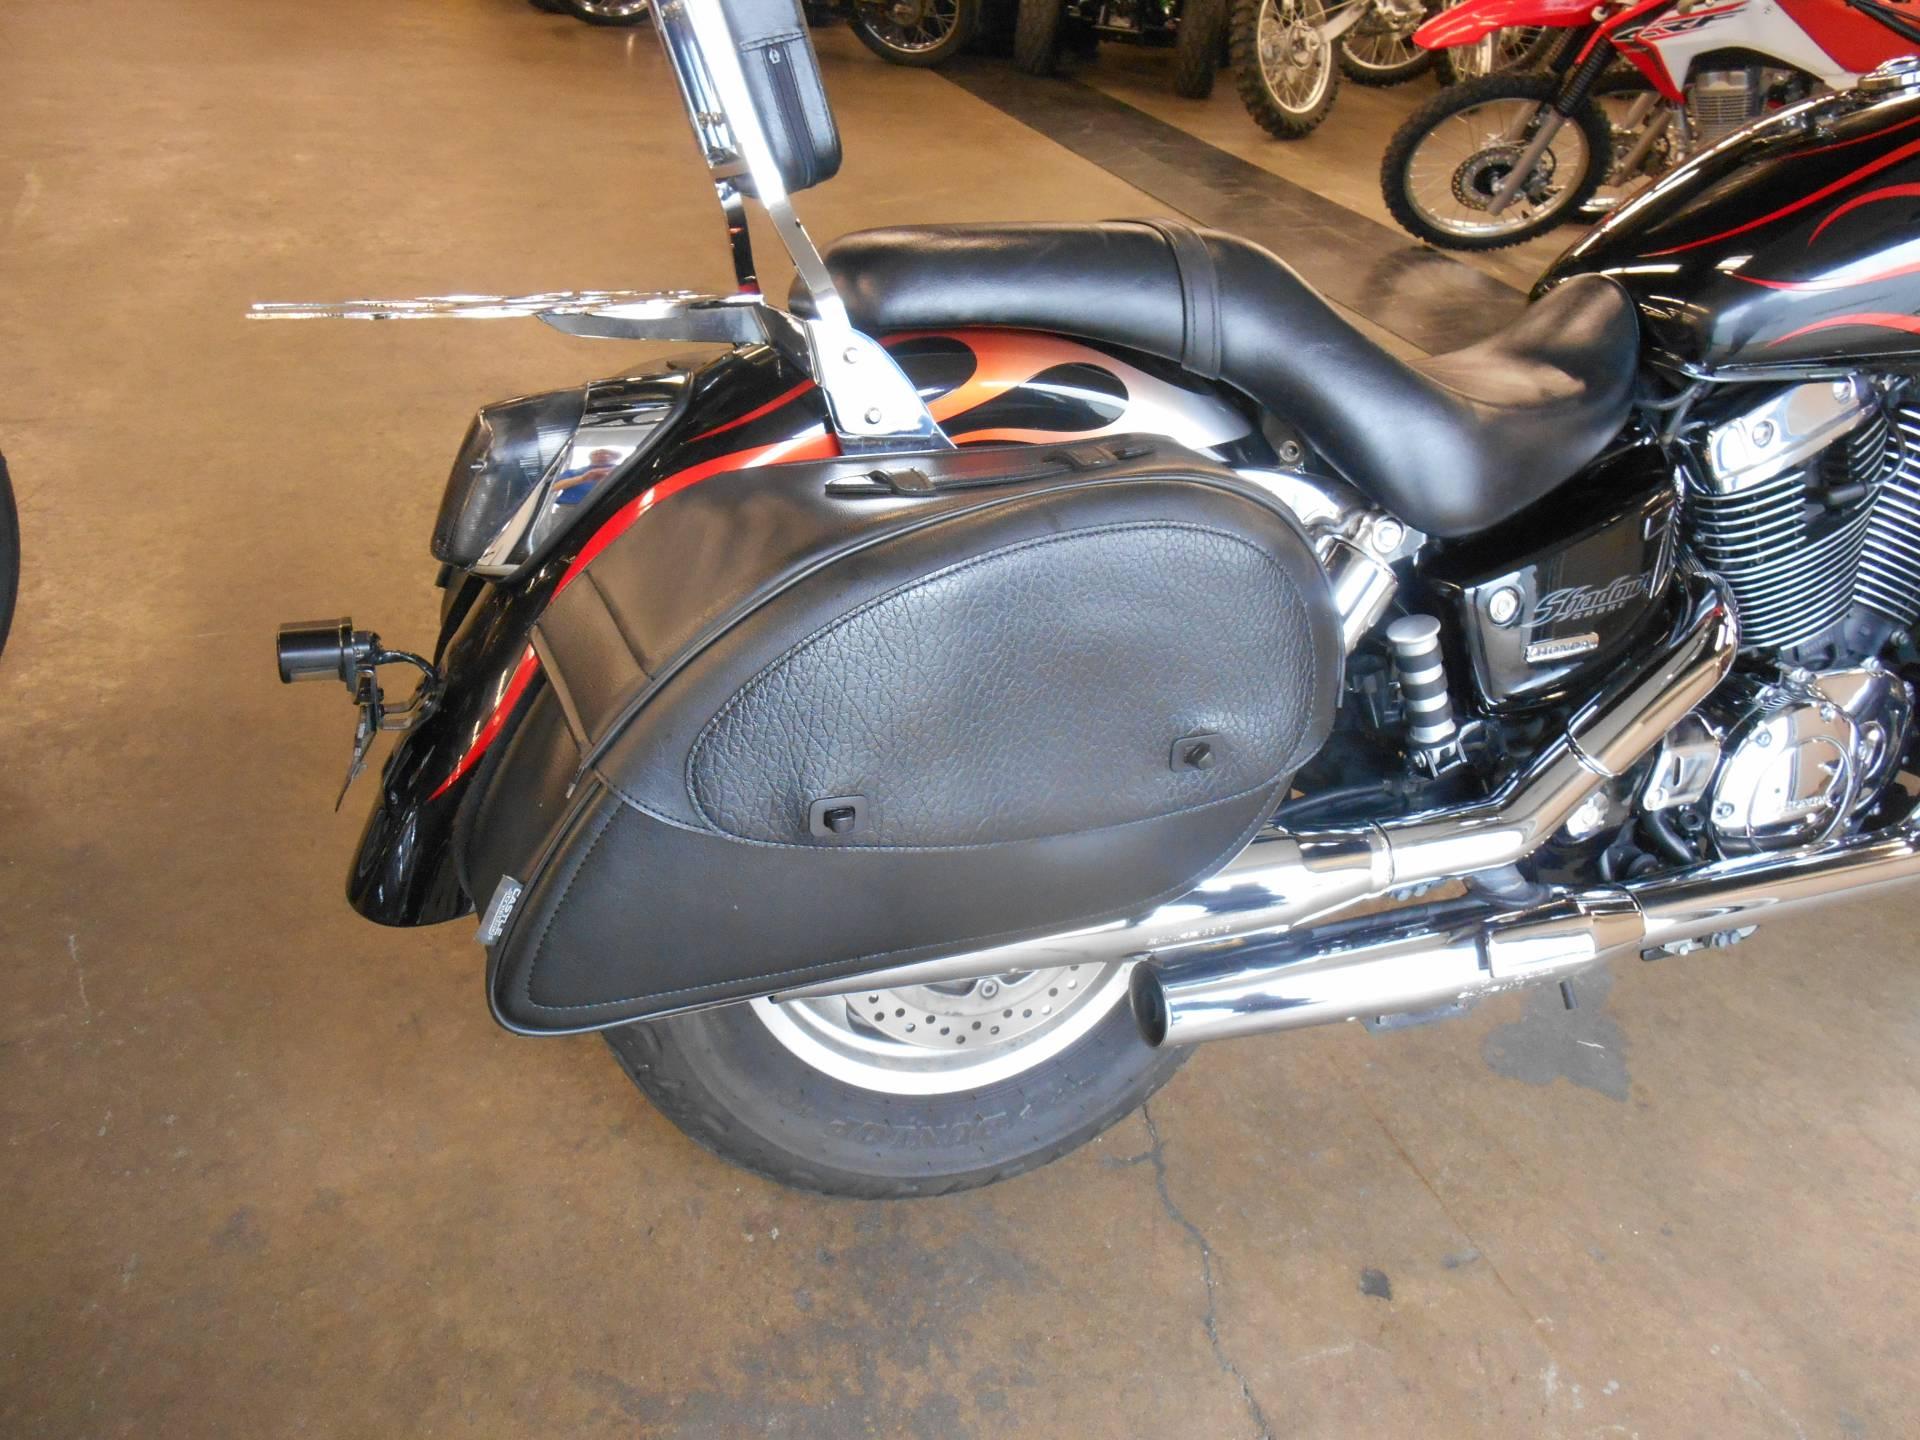 Used 2005 Honda Shadow Sabre 1100 Motorcycles In Dubuque Ia Fuel Filter Iowa